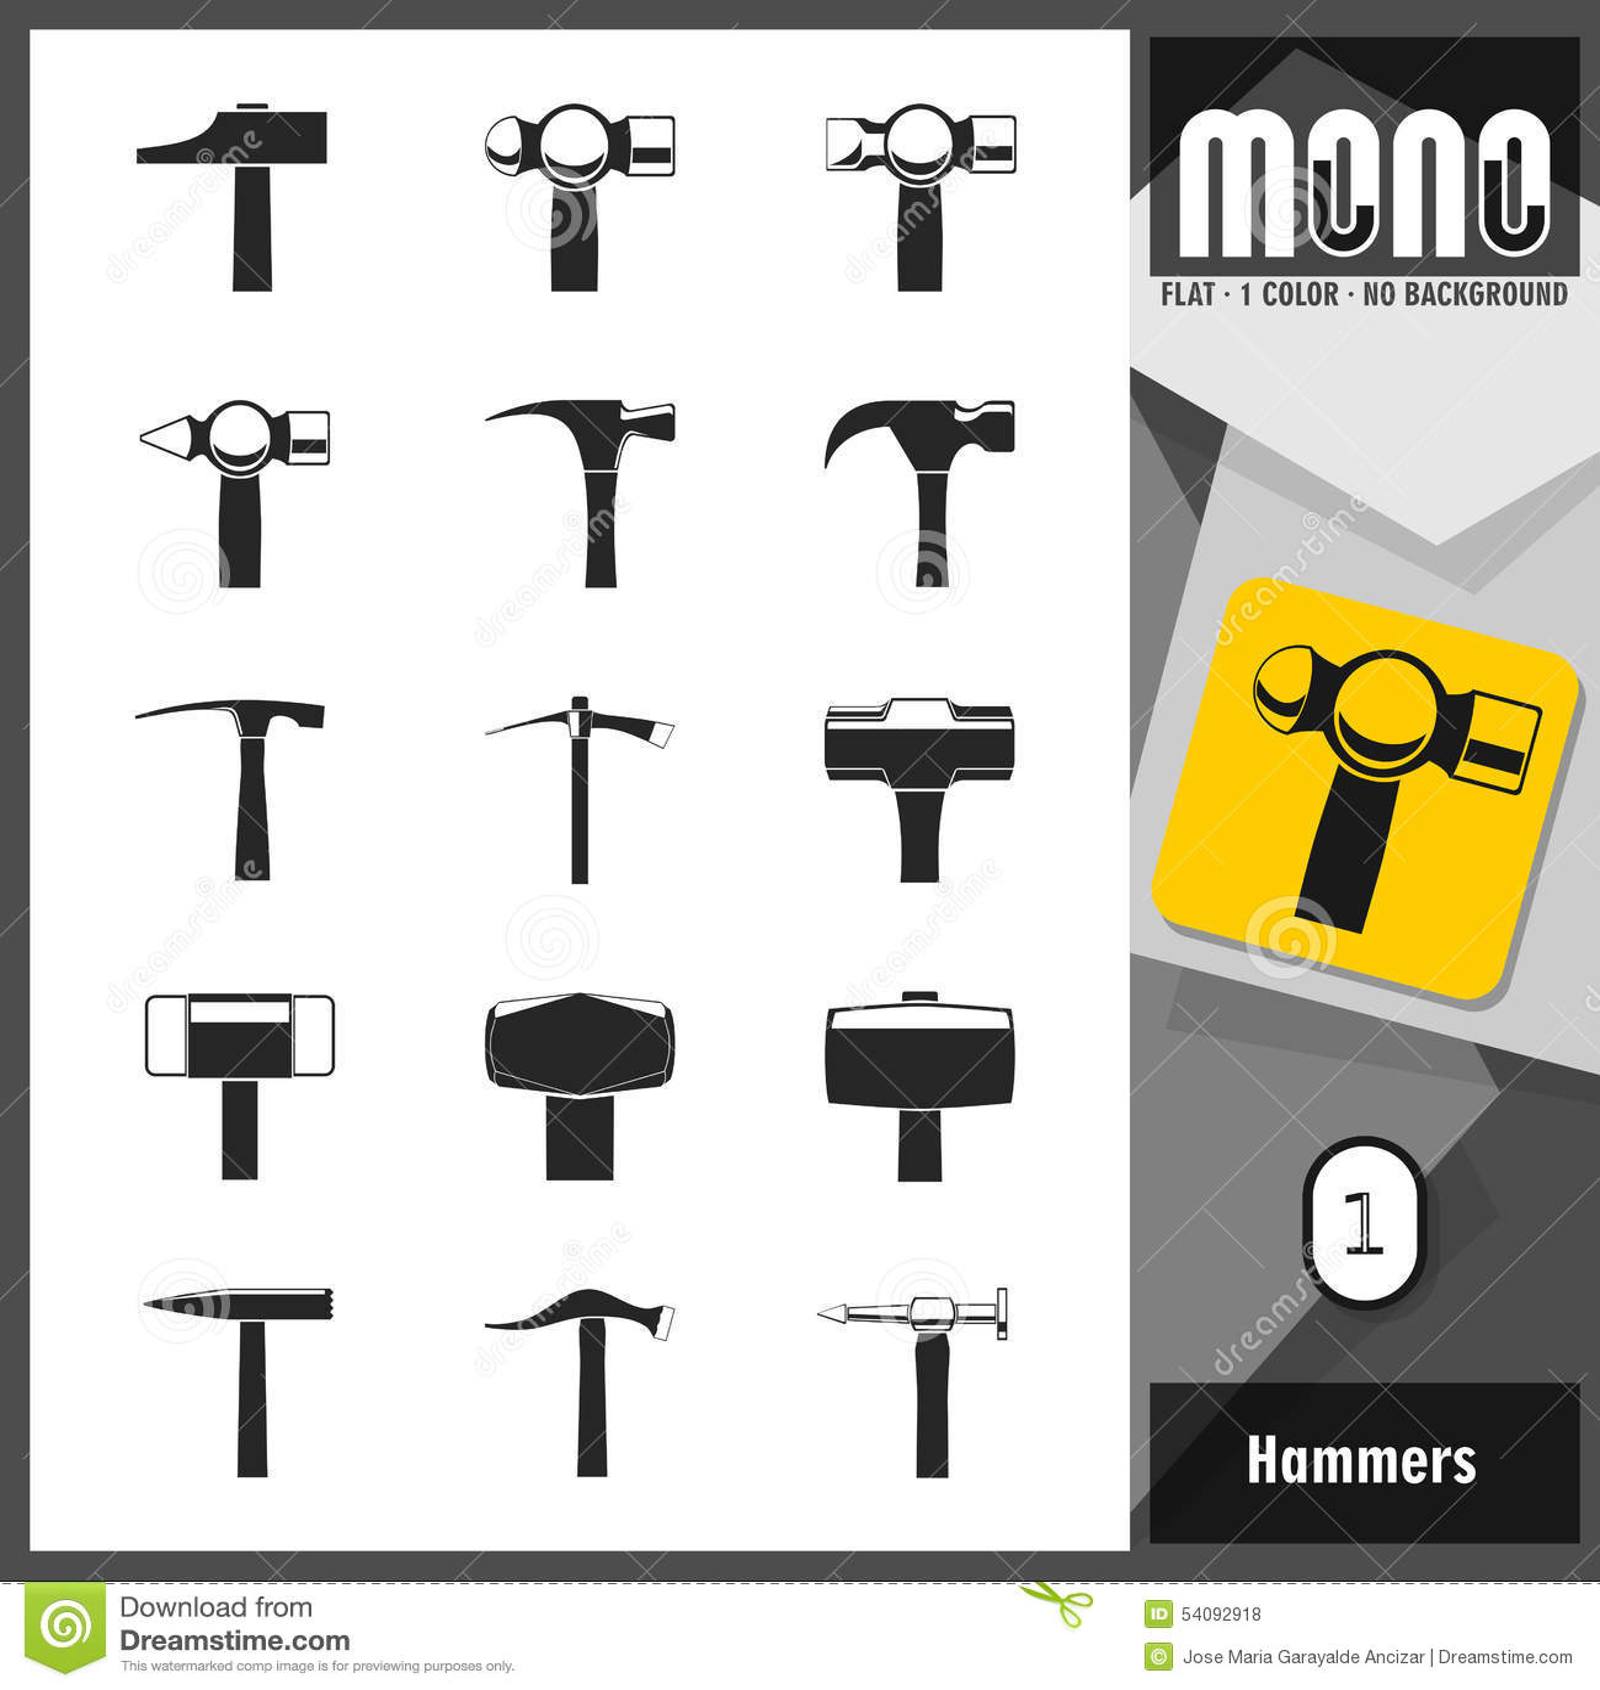 Monopictogrammen - Hamers 1